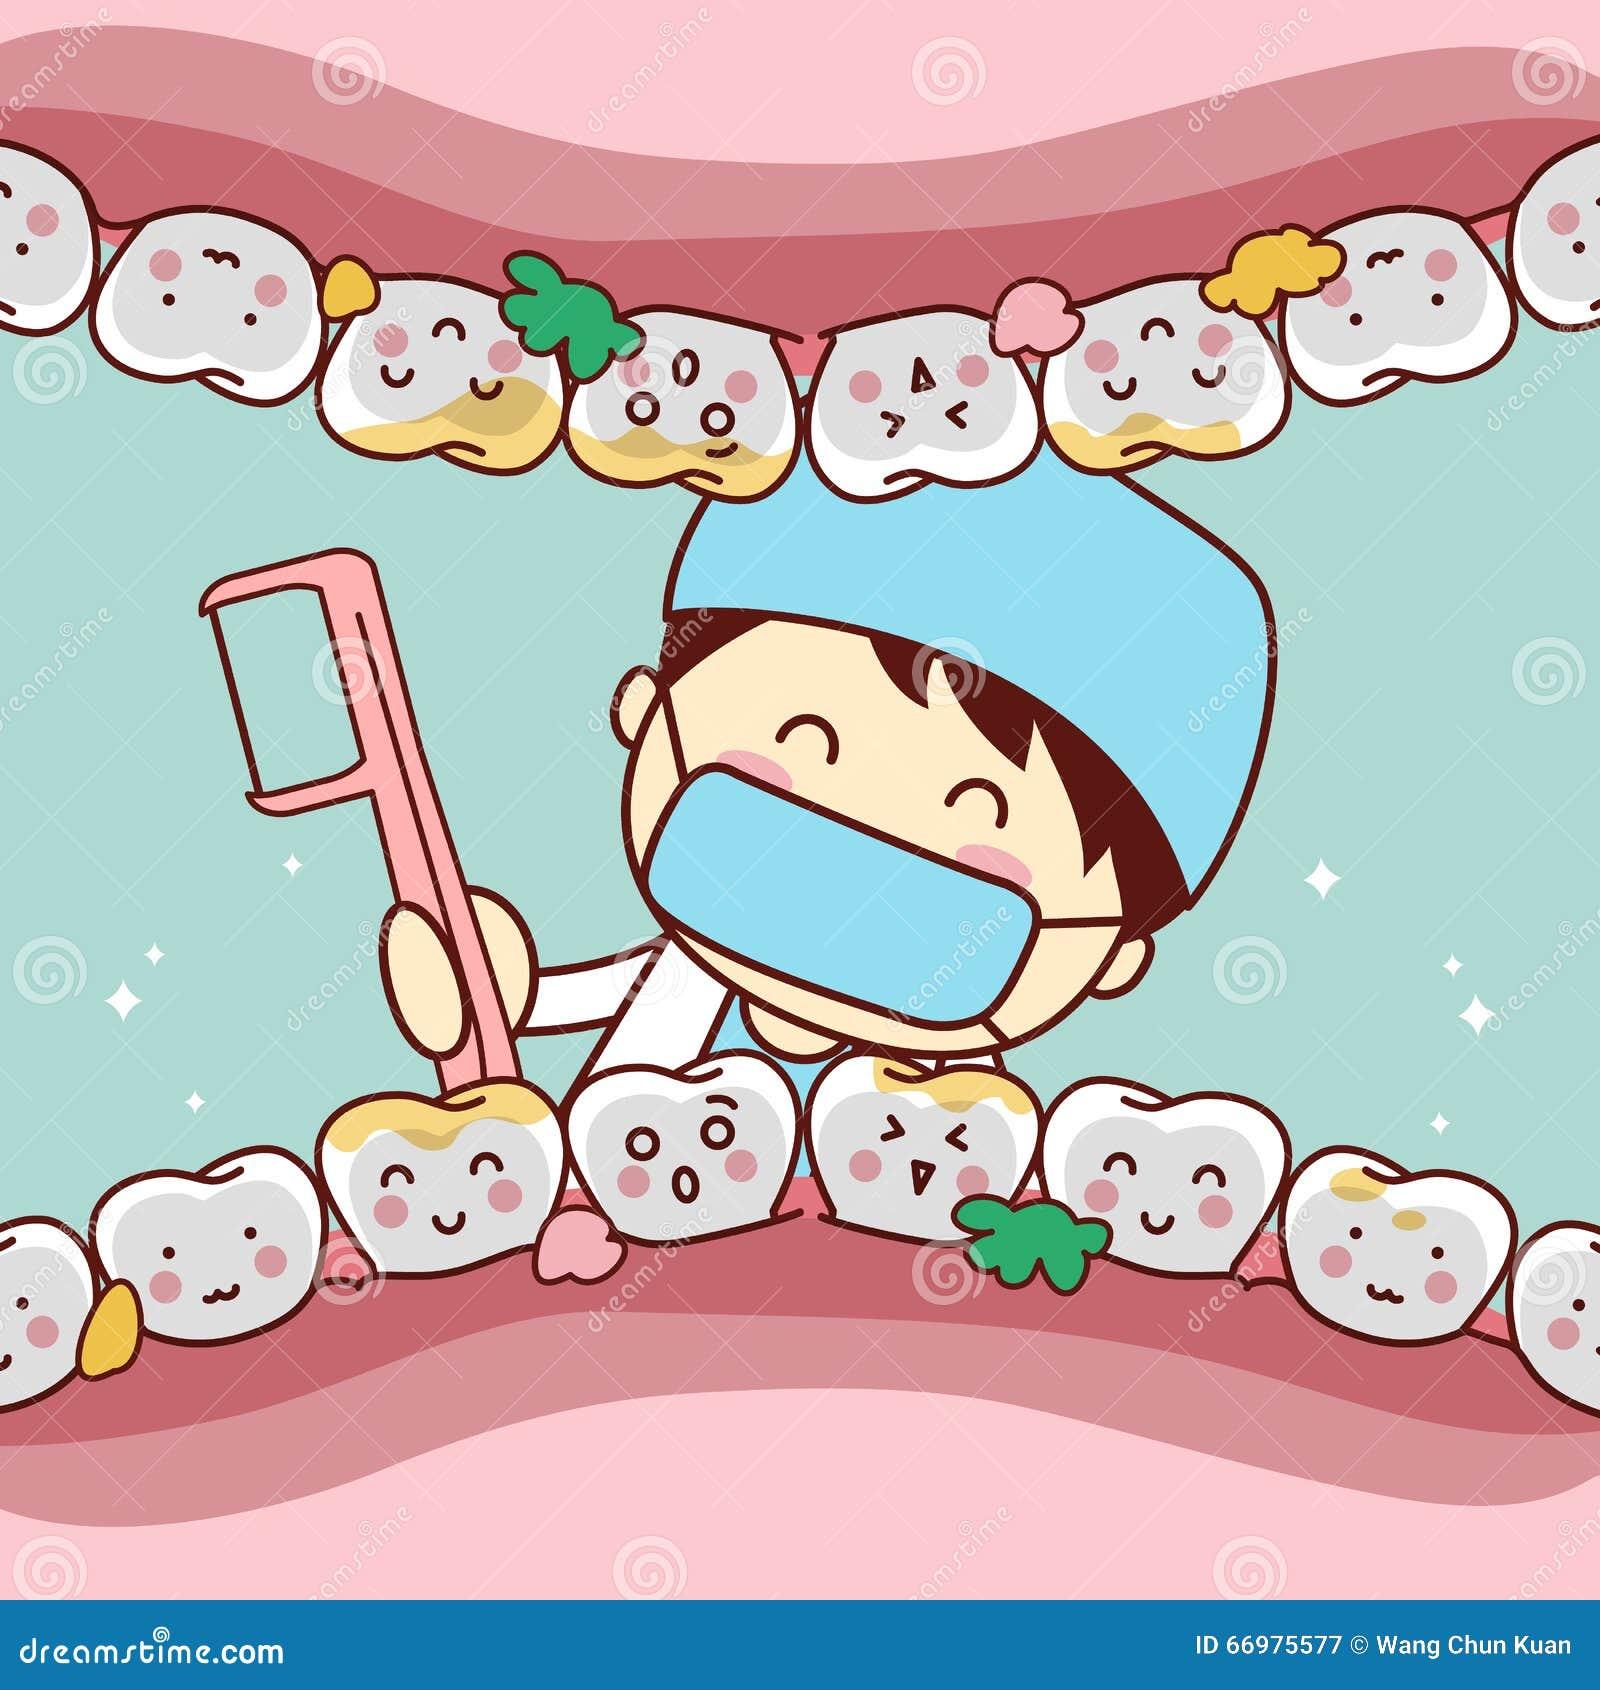 cute-cartoon-dentist-brush-tooth-doctor-clean-floss-great-health-dental-care-concept-66975577.jpg